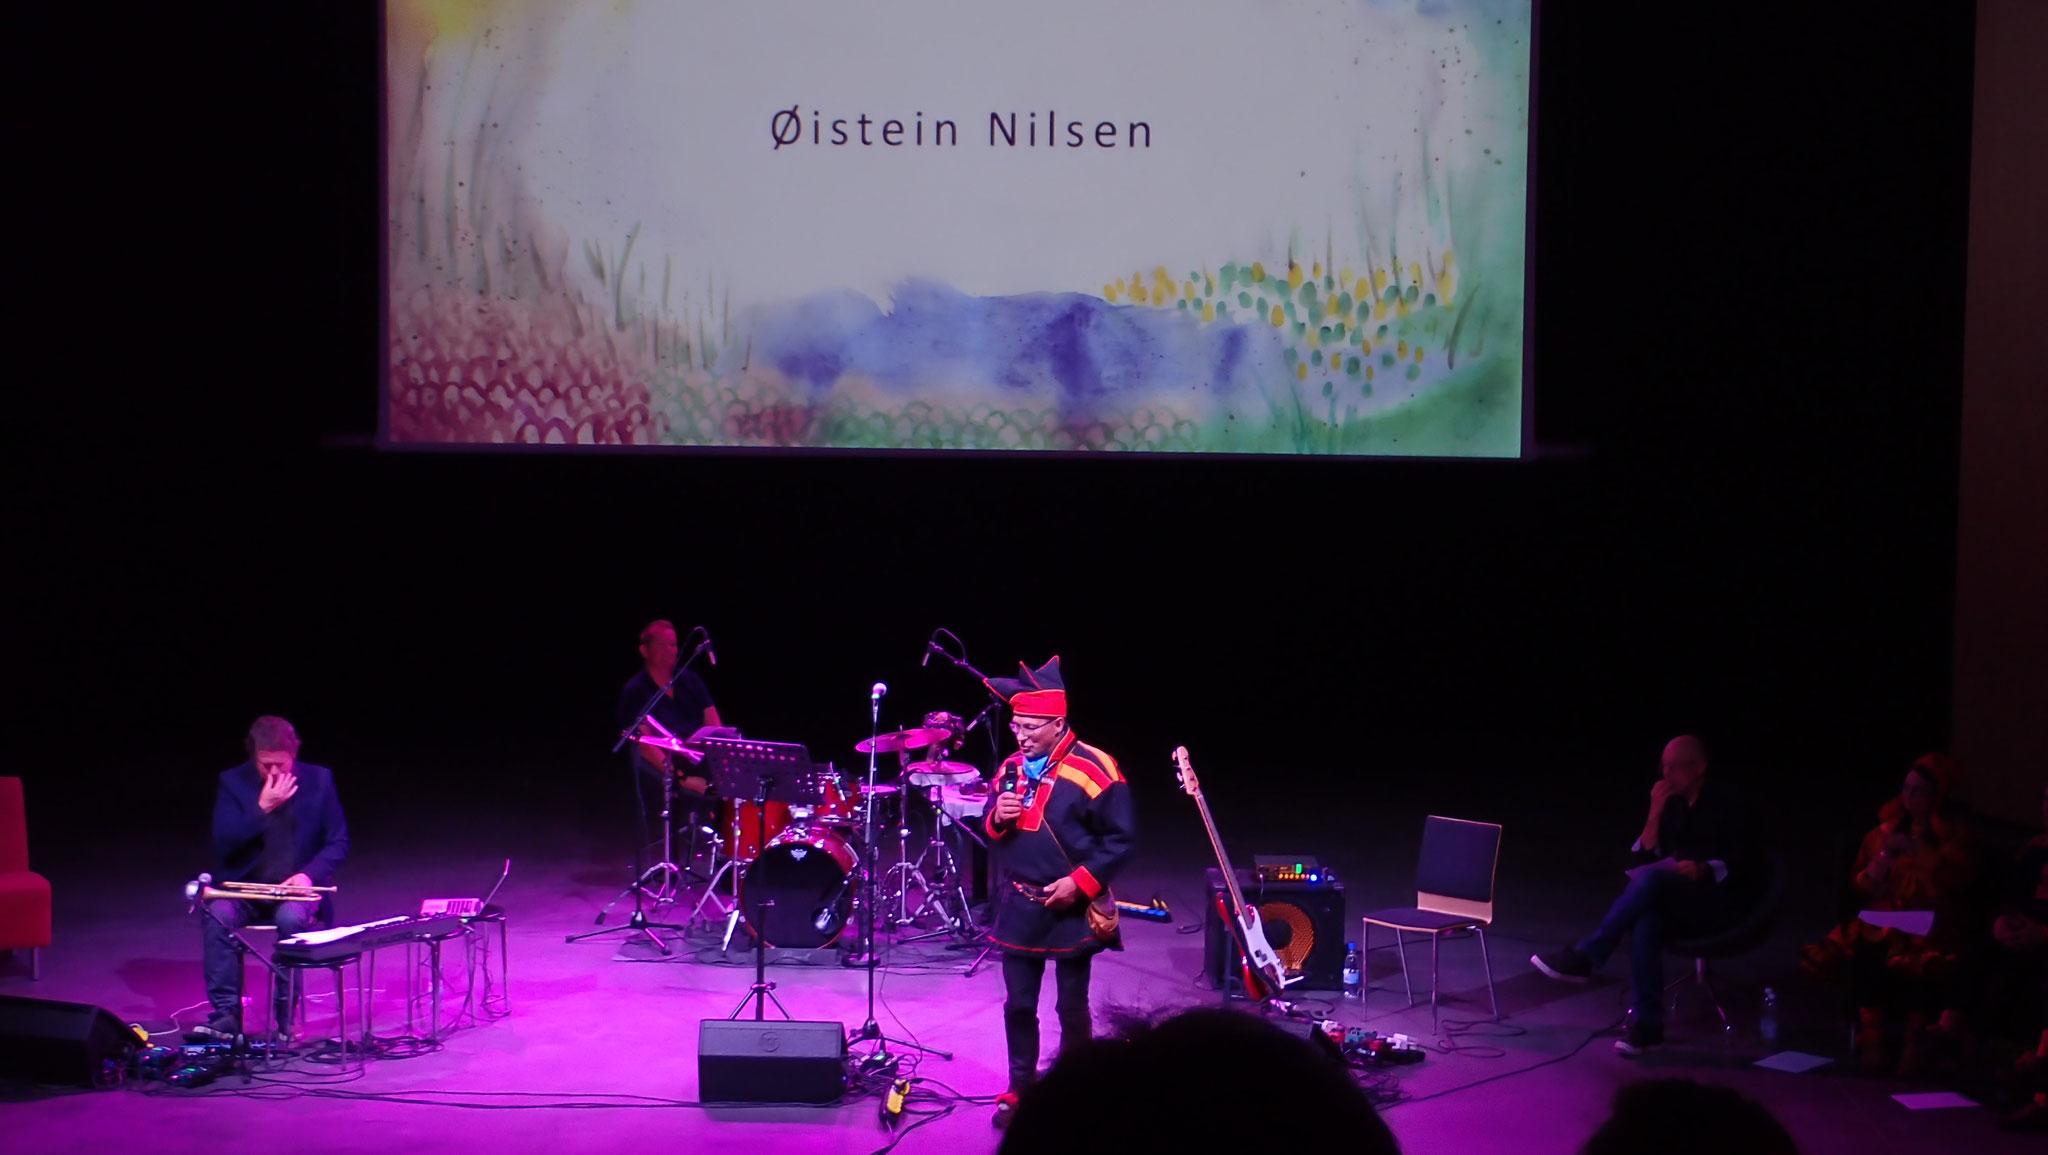 Poetry Øistein Nilsen